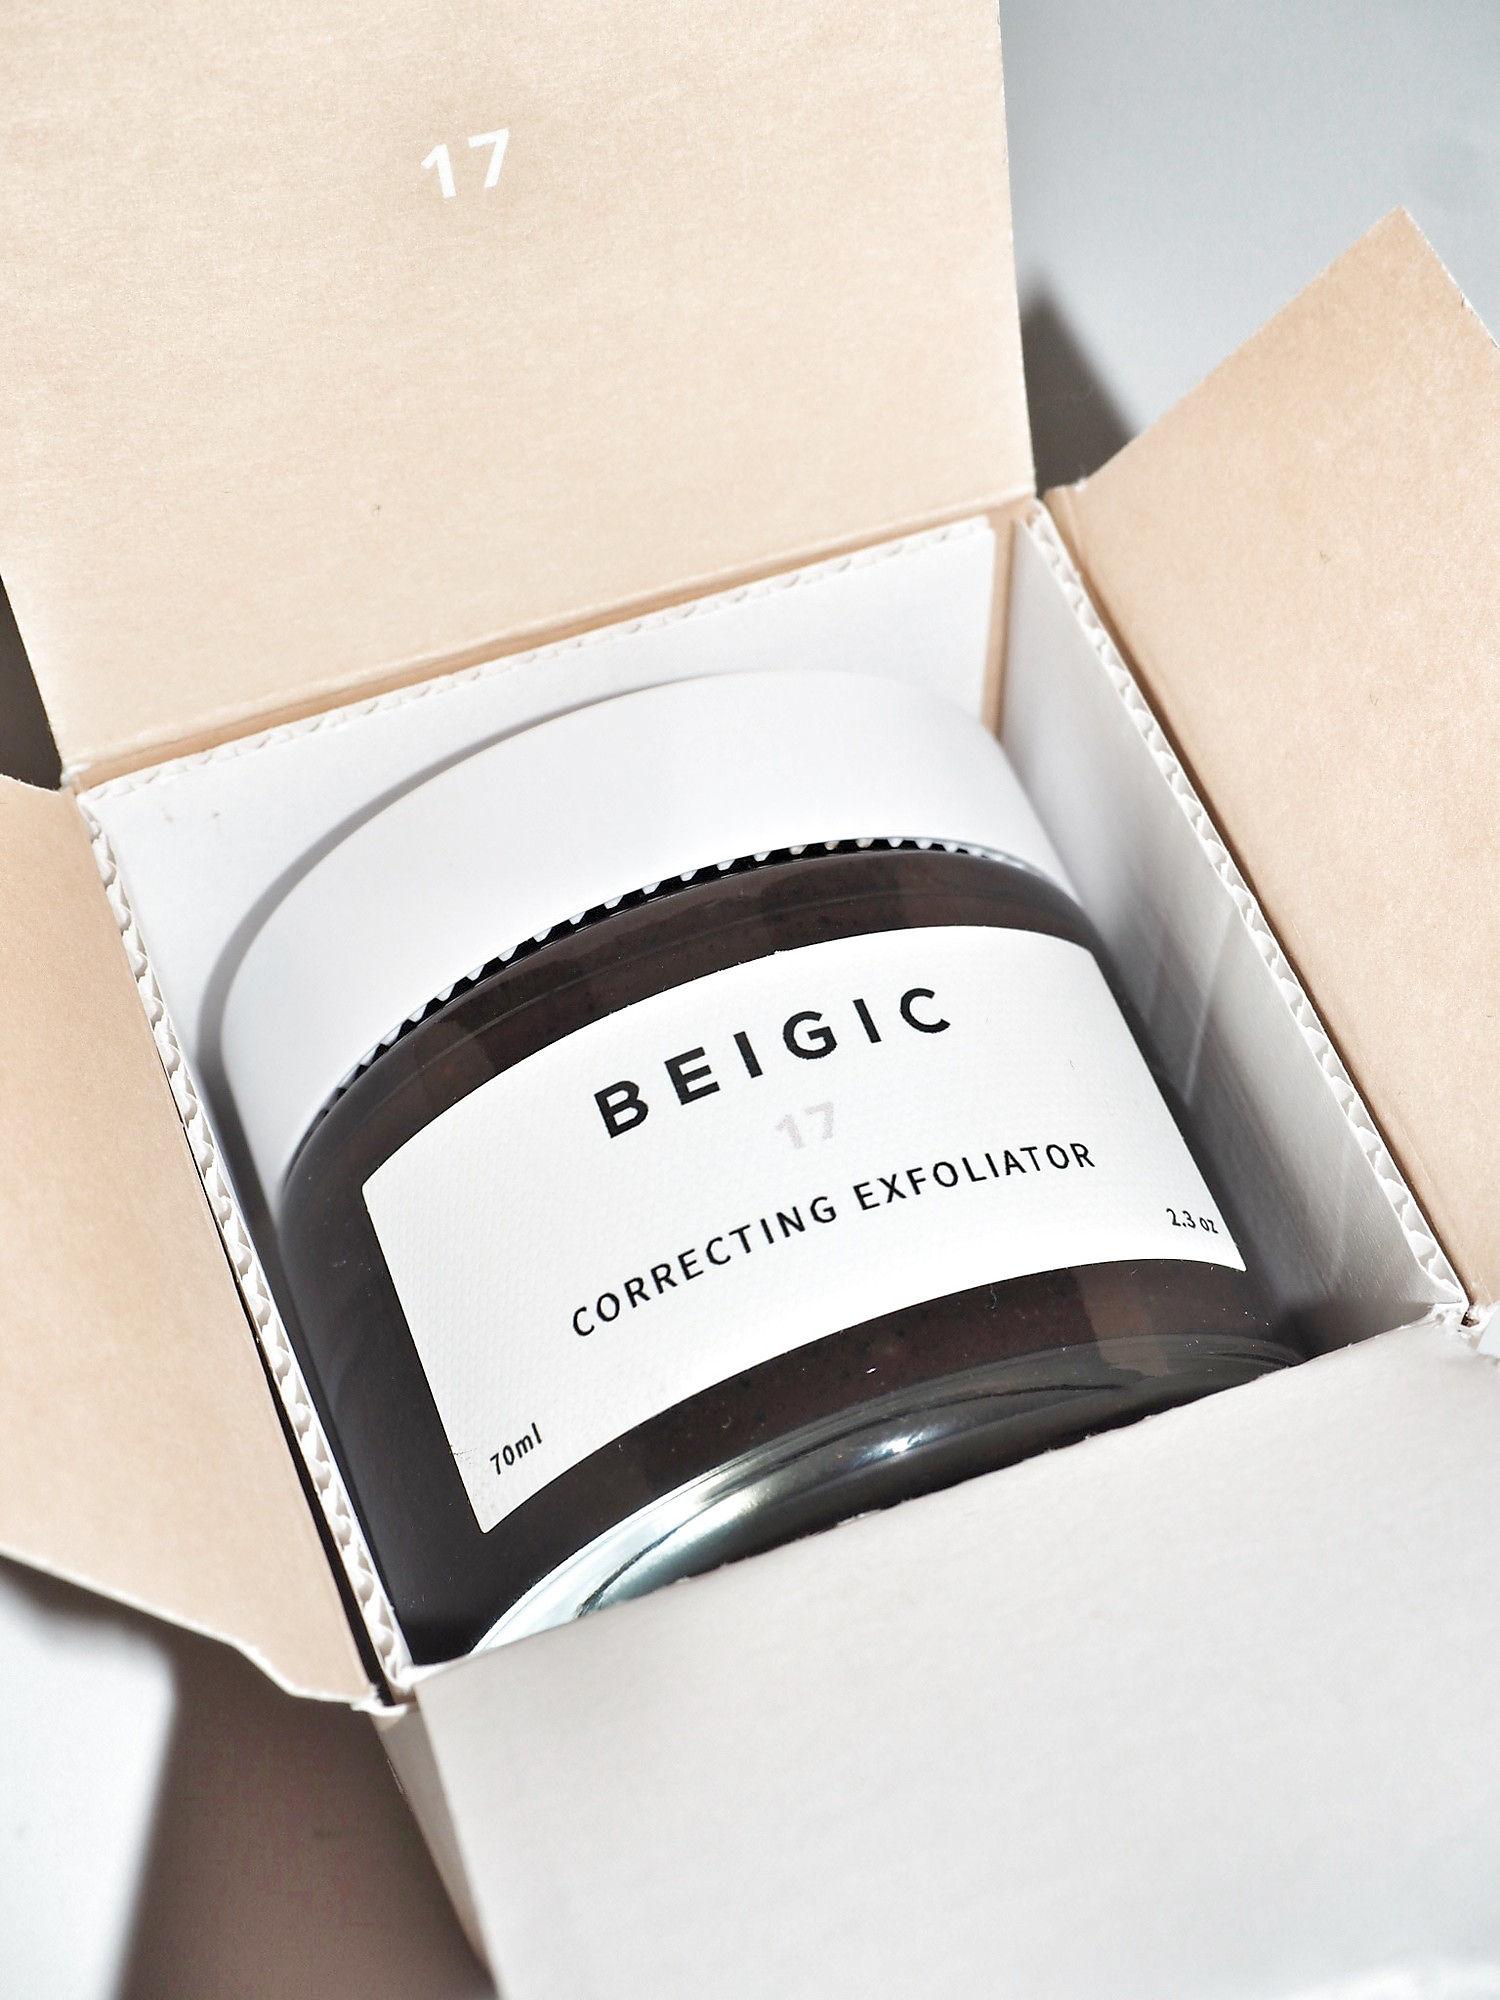 「BEIGIC」のコレクティングエクスフォリエーター